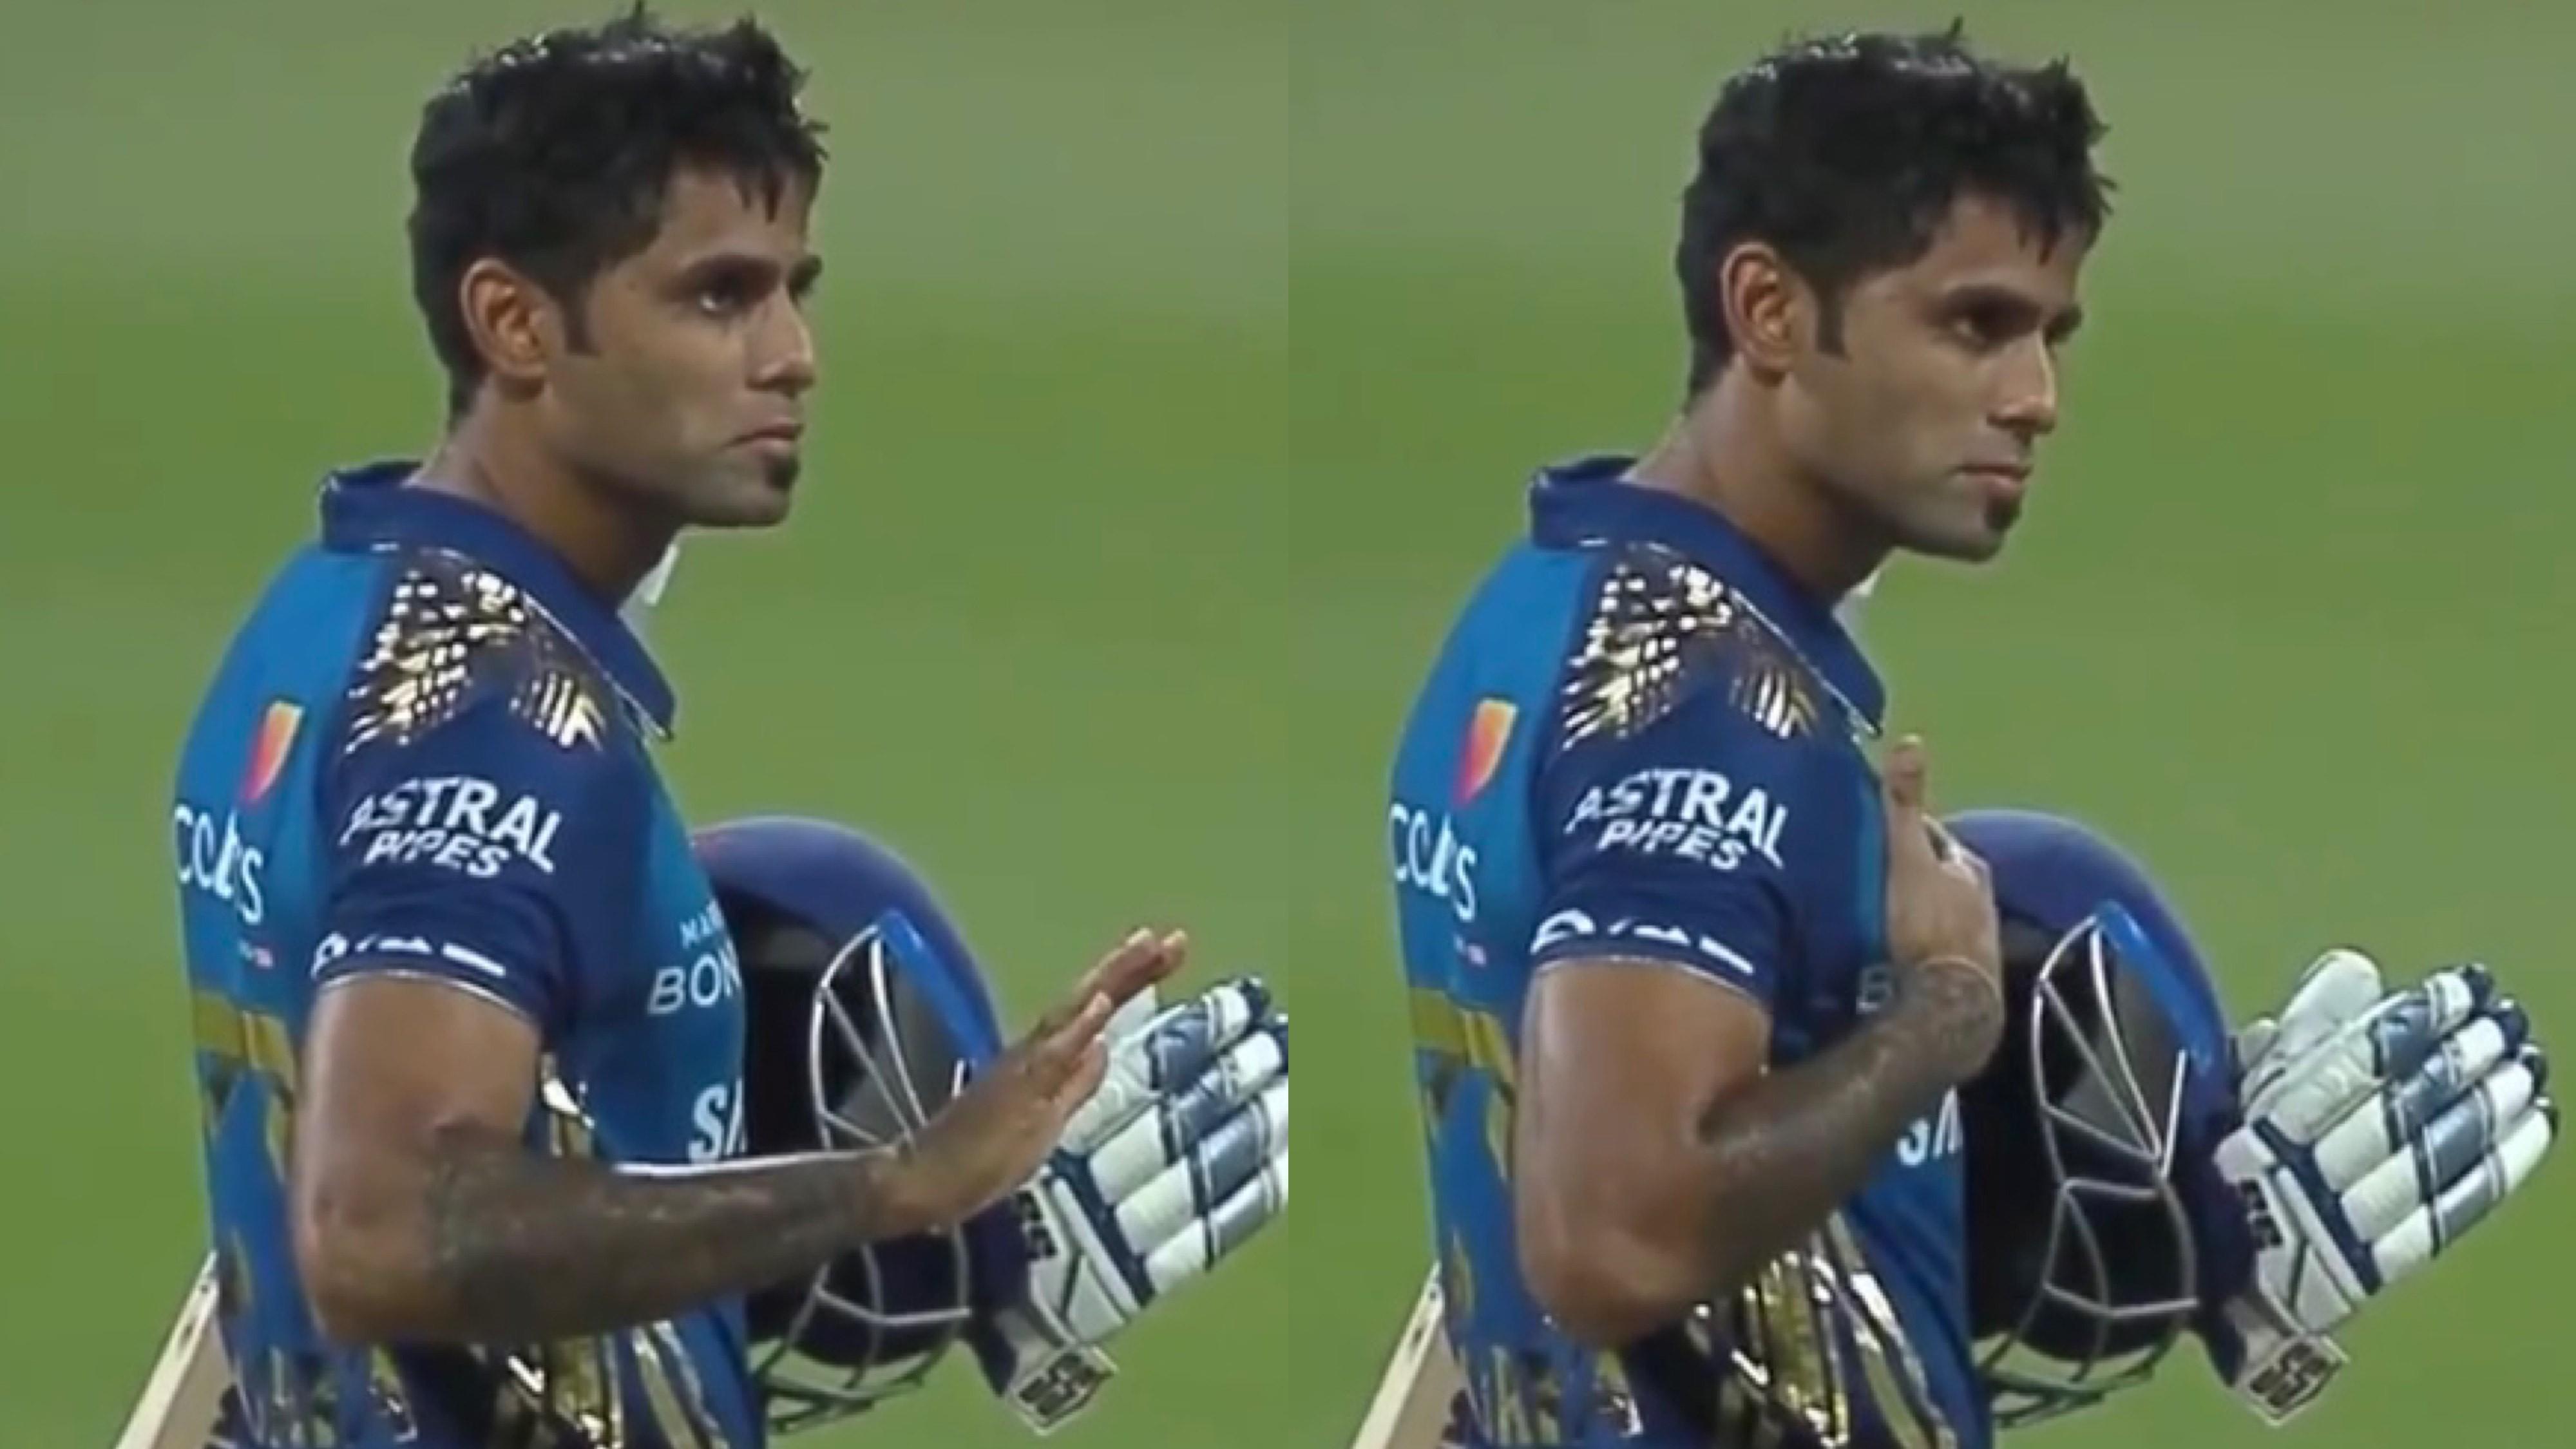 IPL 2020: WATCH - Surya Kumar Yadav's 'Main Hoon Naa' gesture post winning the game for MI